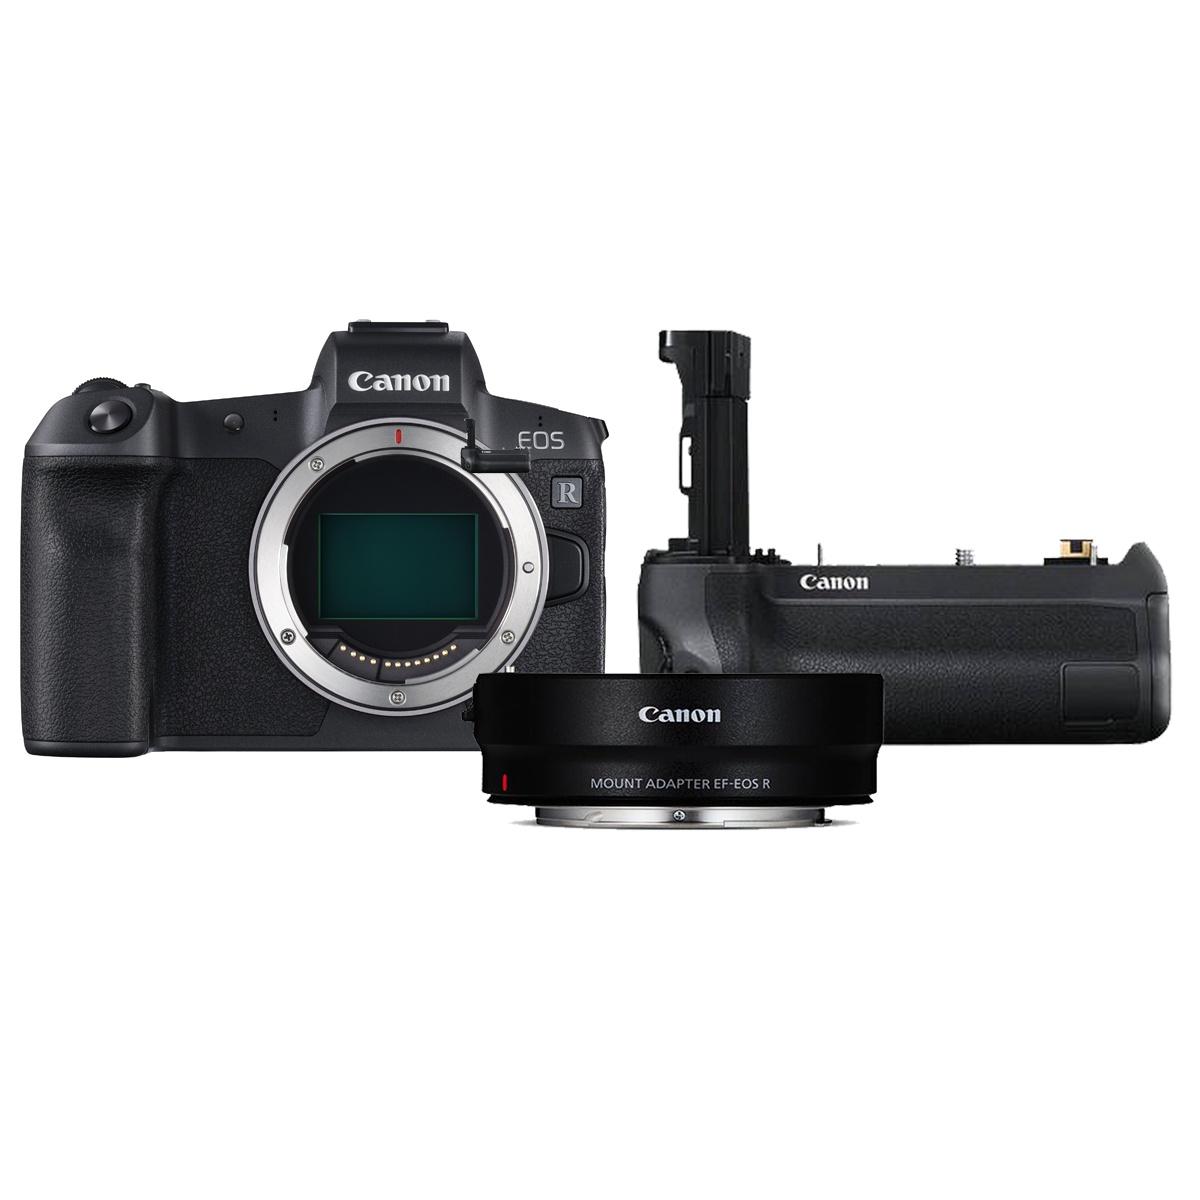 Canon EOS R Kit mit EF-EOS R-Adapter + BG-E22 Handgriff